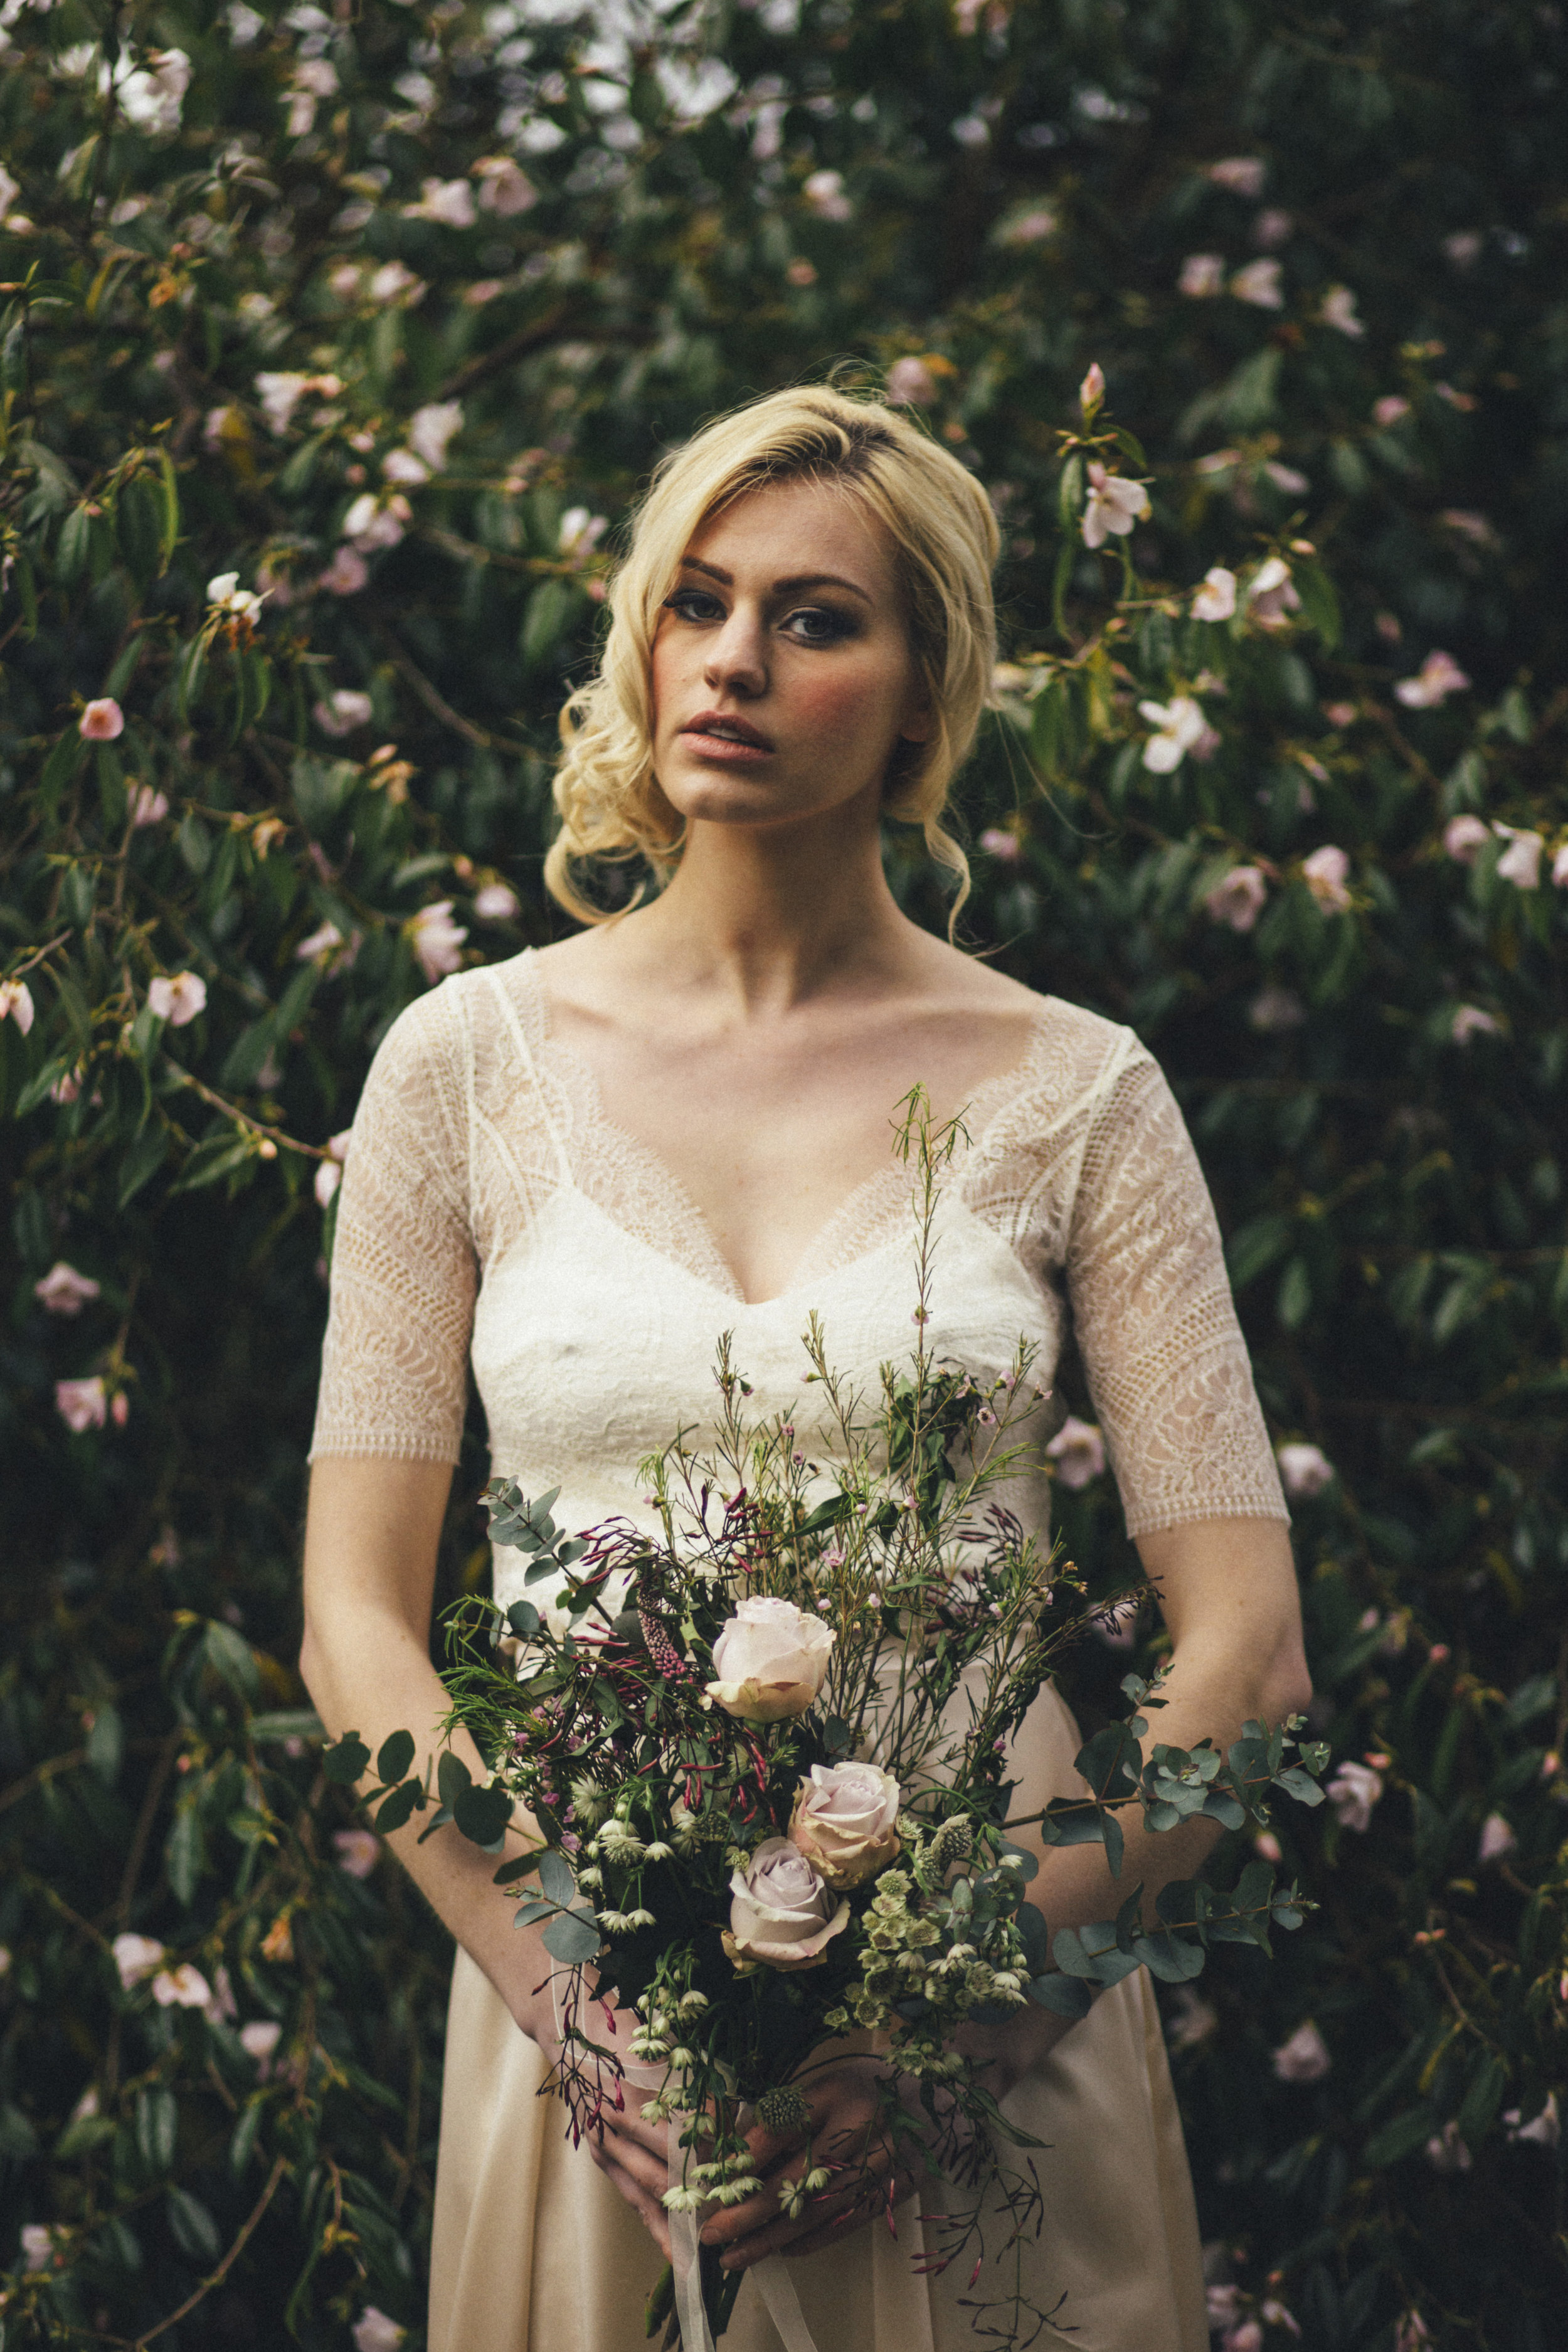 Spring-Bridal-Kate-Beaumont-Shelley-Richmond-Vintage-Wedding-Dress-10.jpg